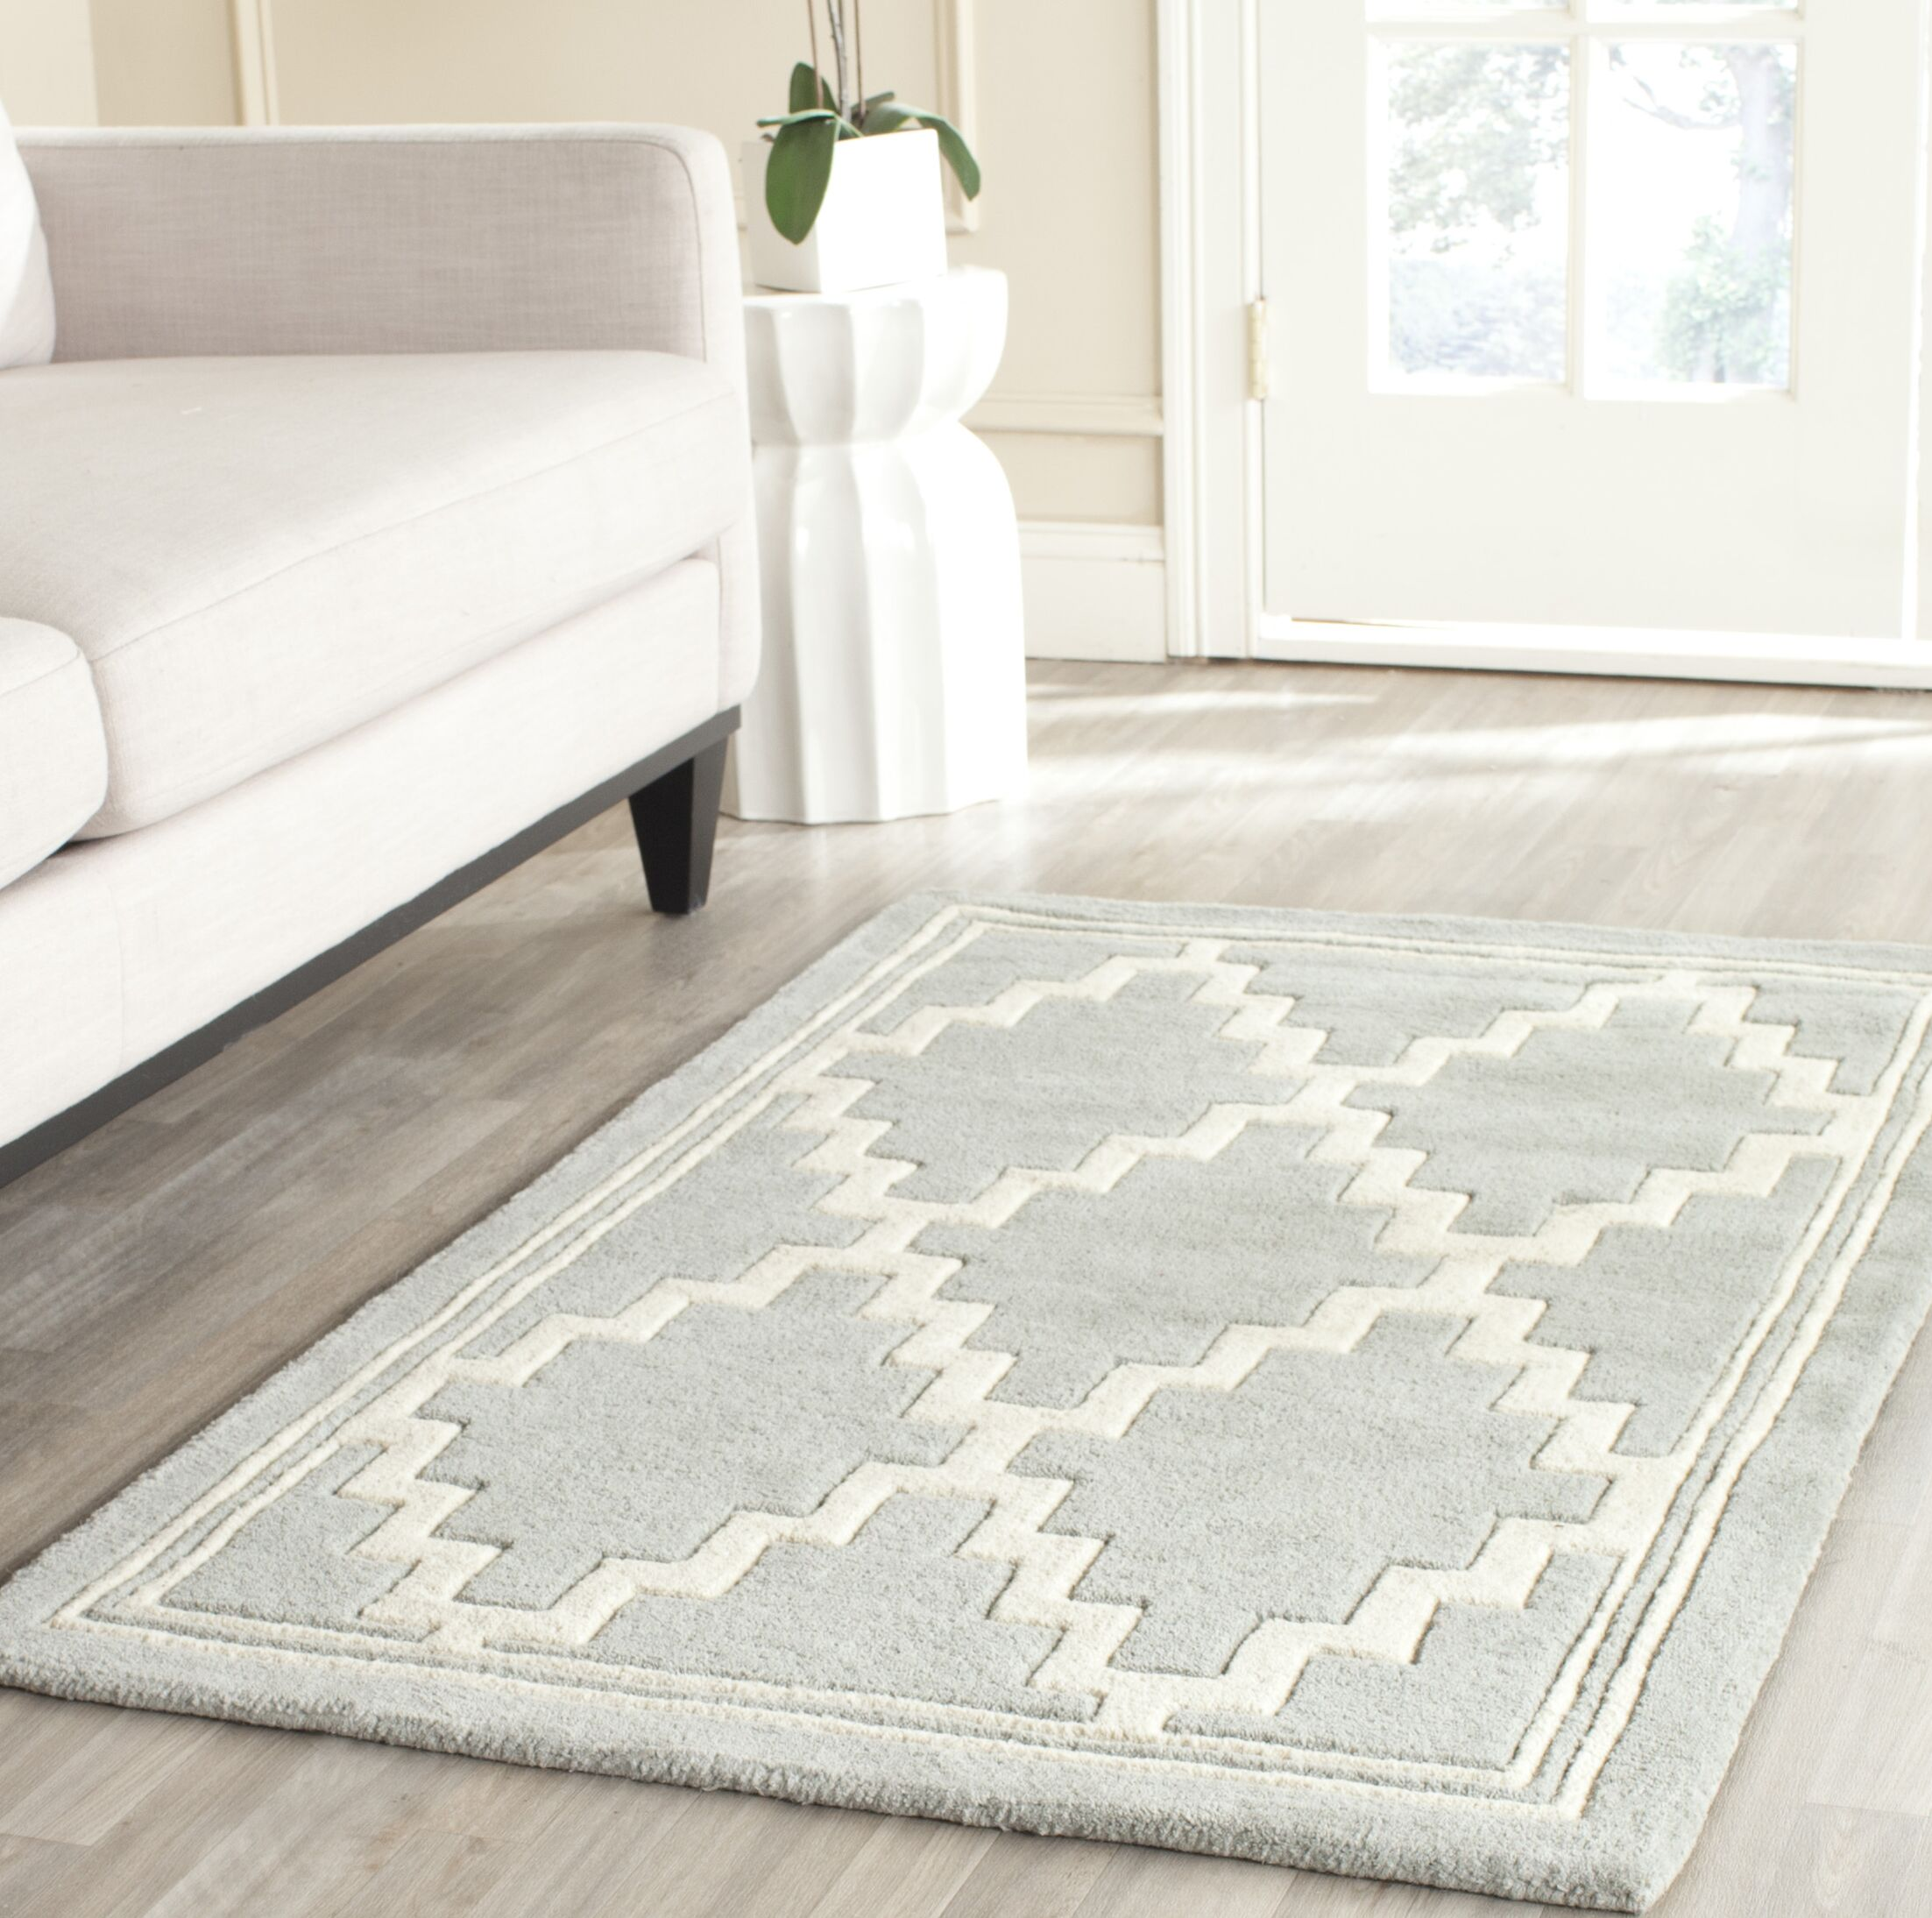 Wilkin Hand-Tufted Wool Gray Rug Rug Size: Rectangle 4' x 6'